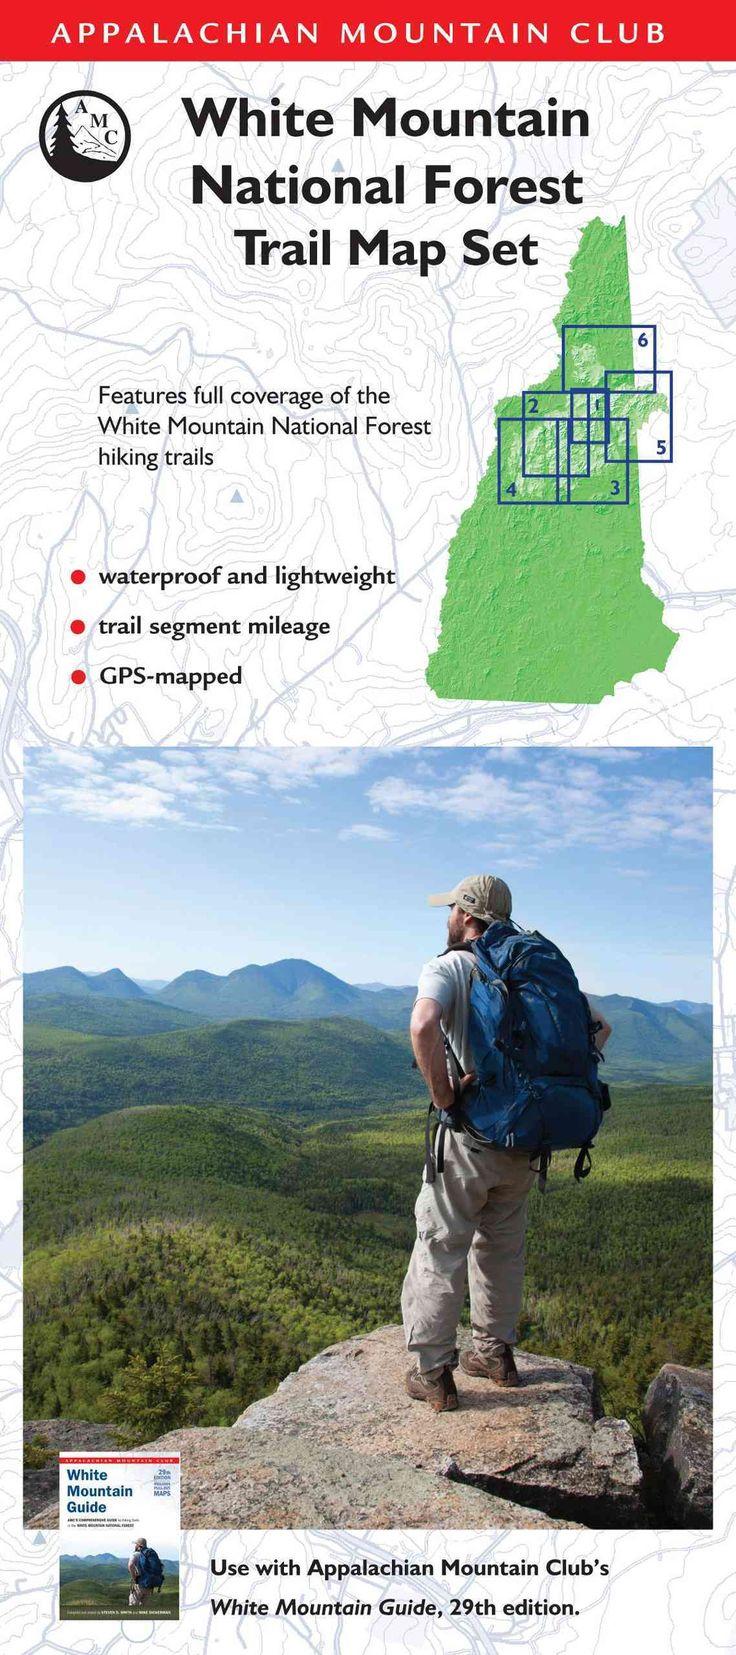 Top Best Appalachian Mountains Map Ideas On Pinterest - Appalachian mountains on us map